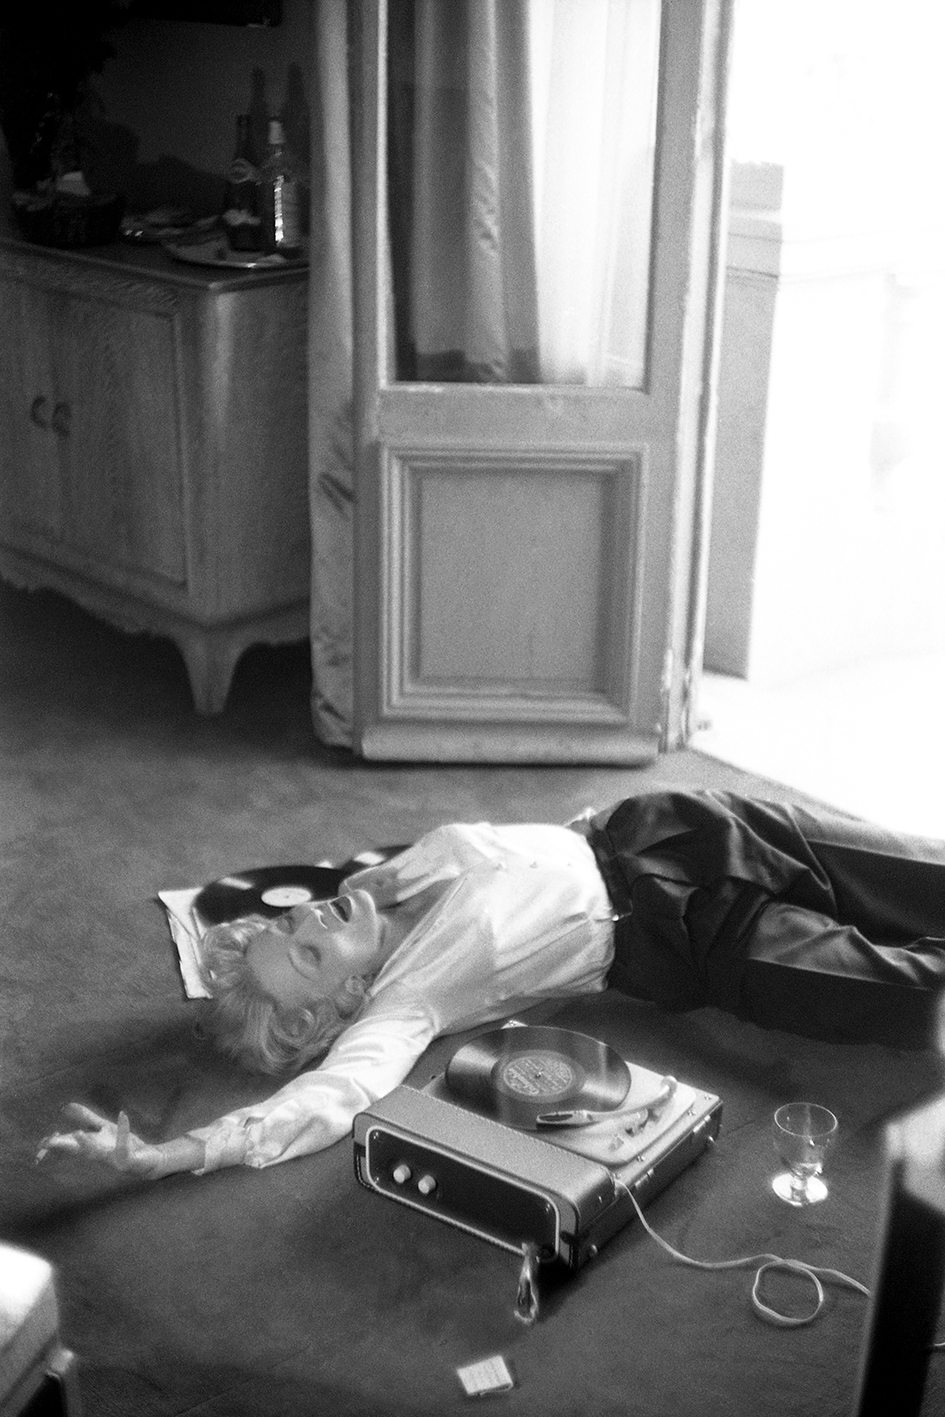 Marlène Dietrich lying on the floor, L'hotel de Paris, Monte Carlo, 1956